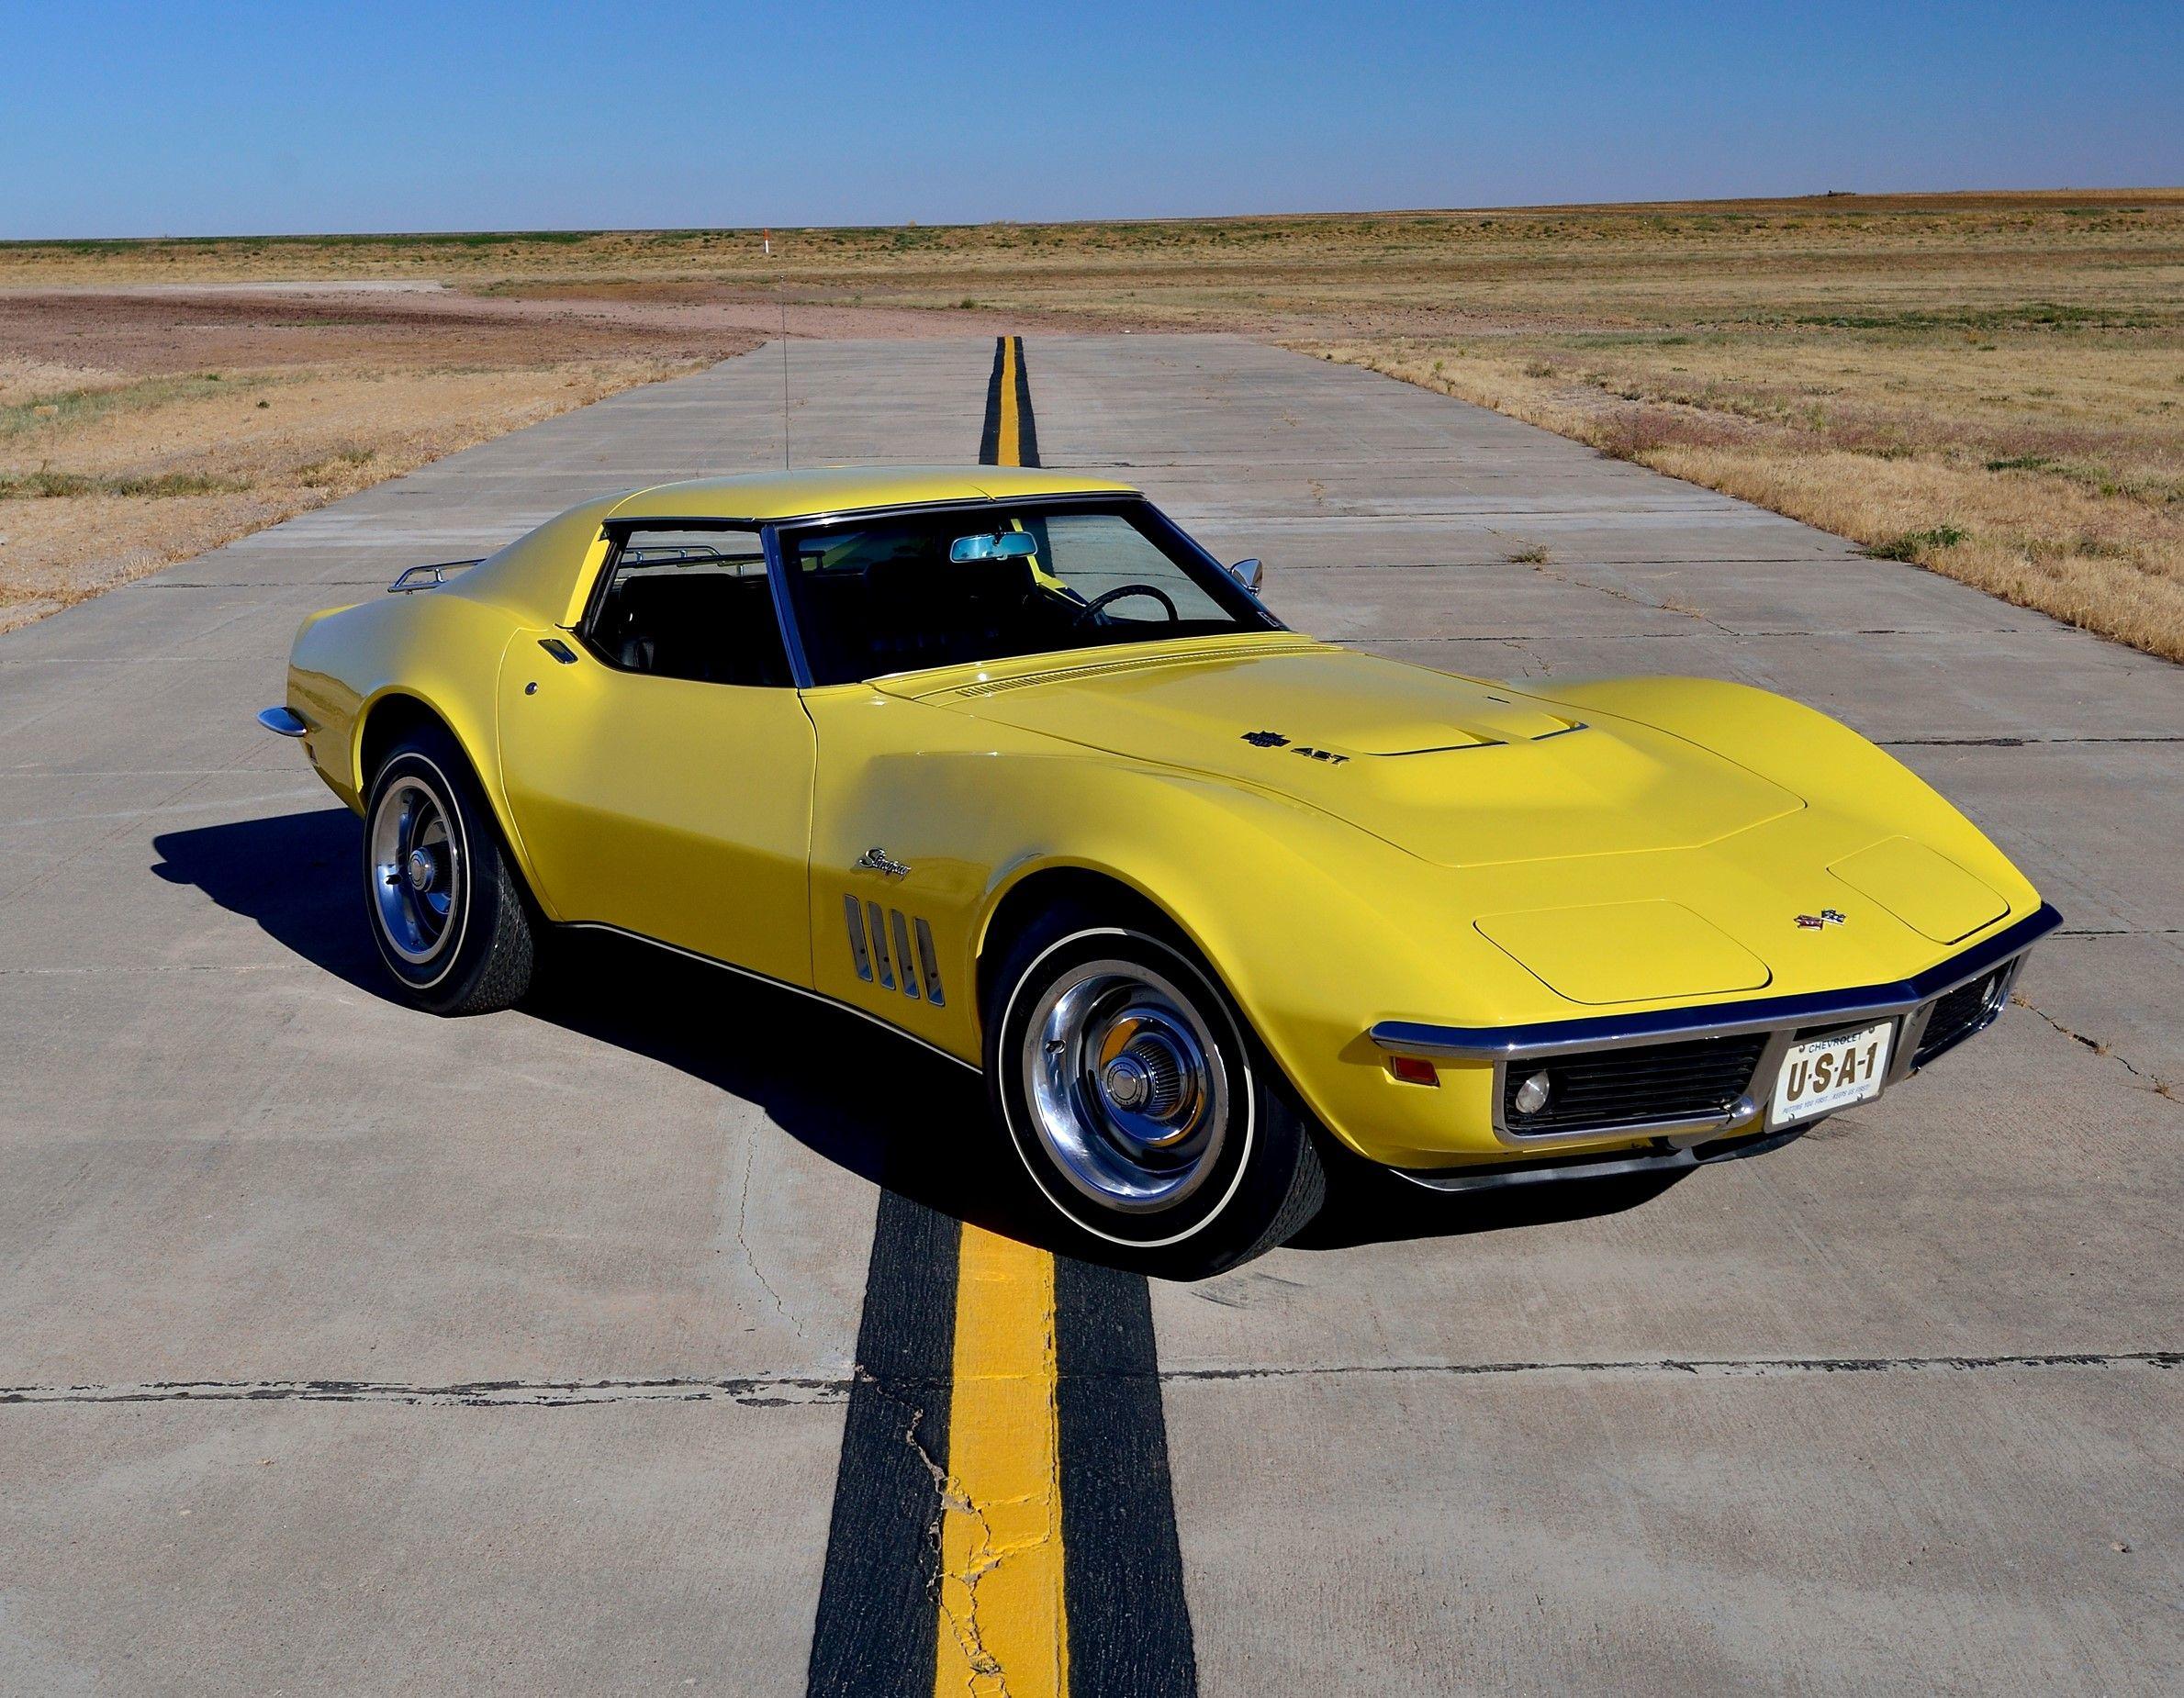 1969 c3 stingray l71 427435 hp sport coupe chevrolet